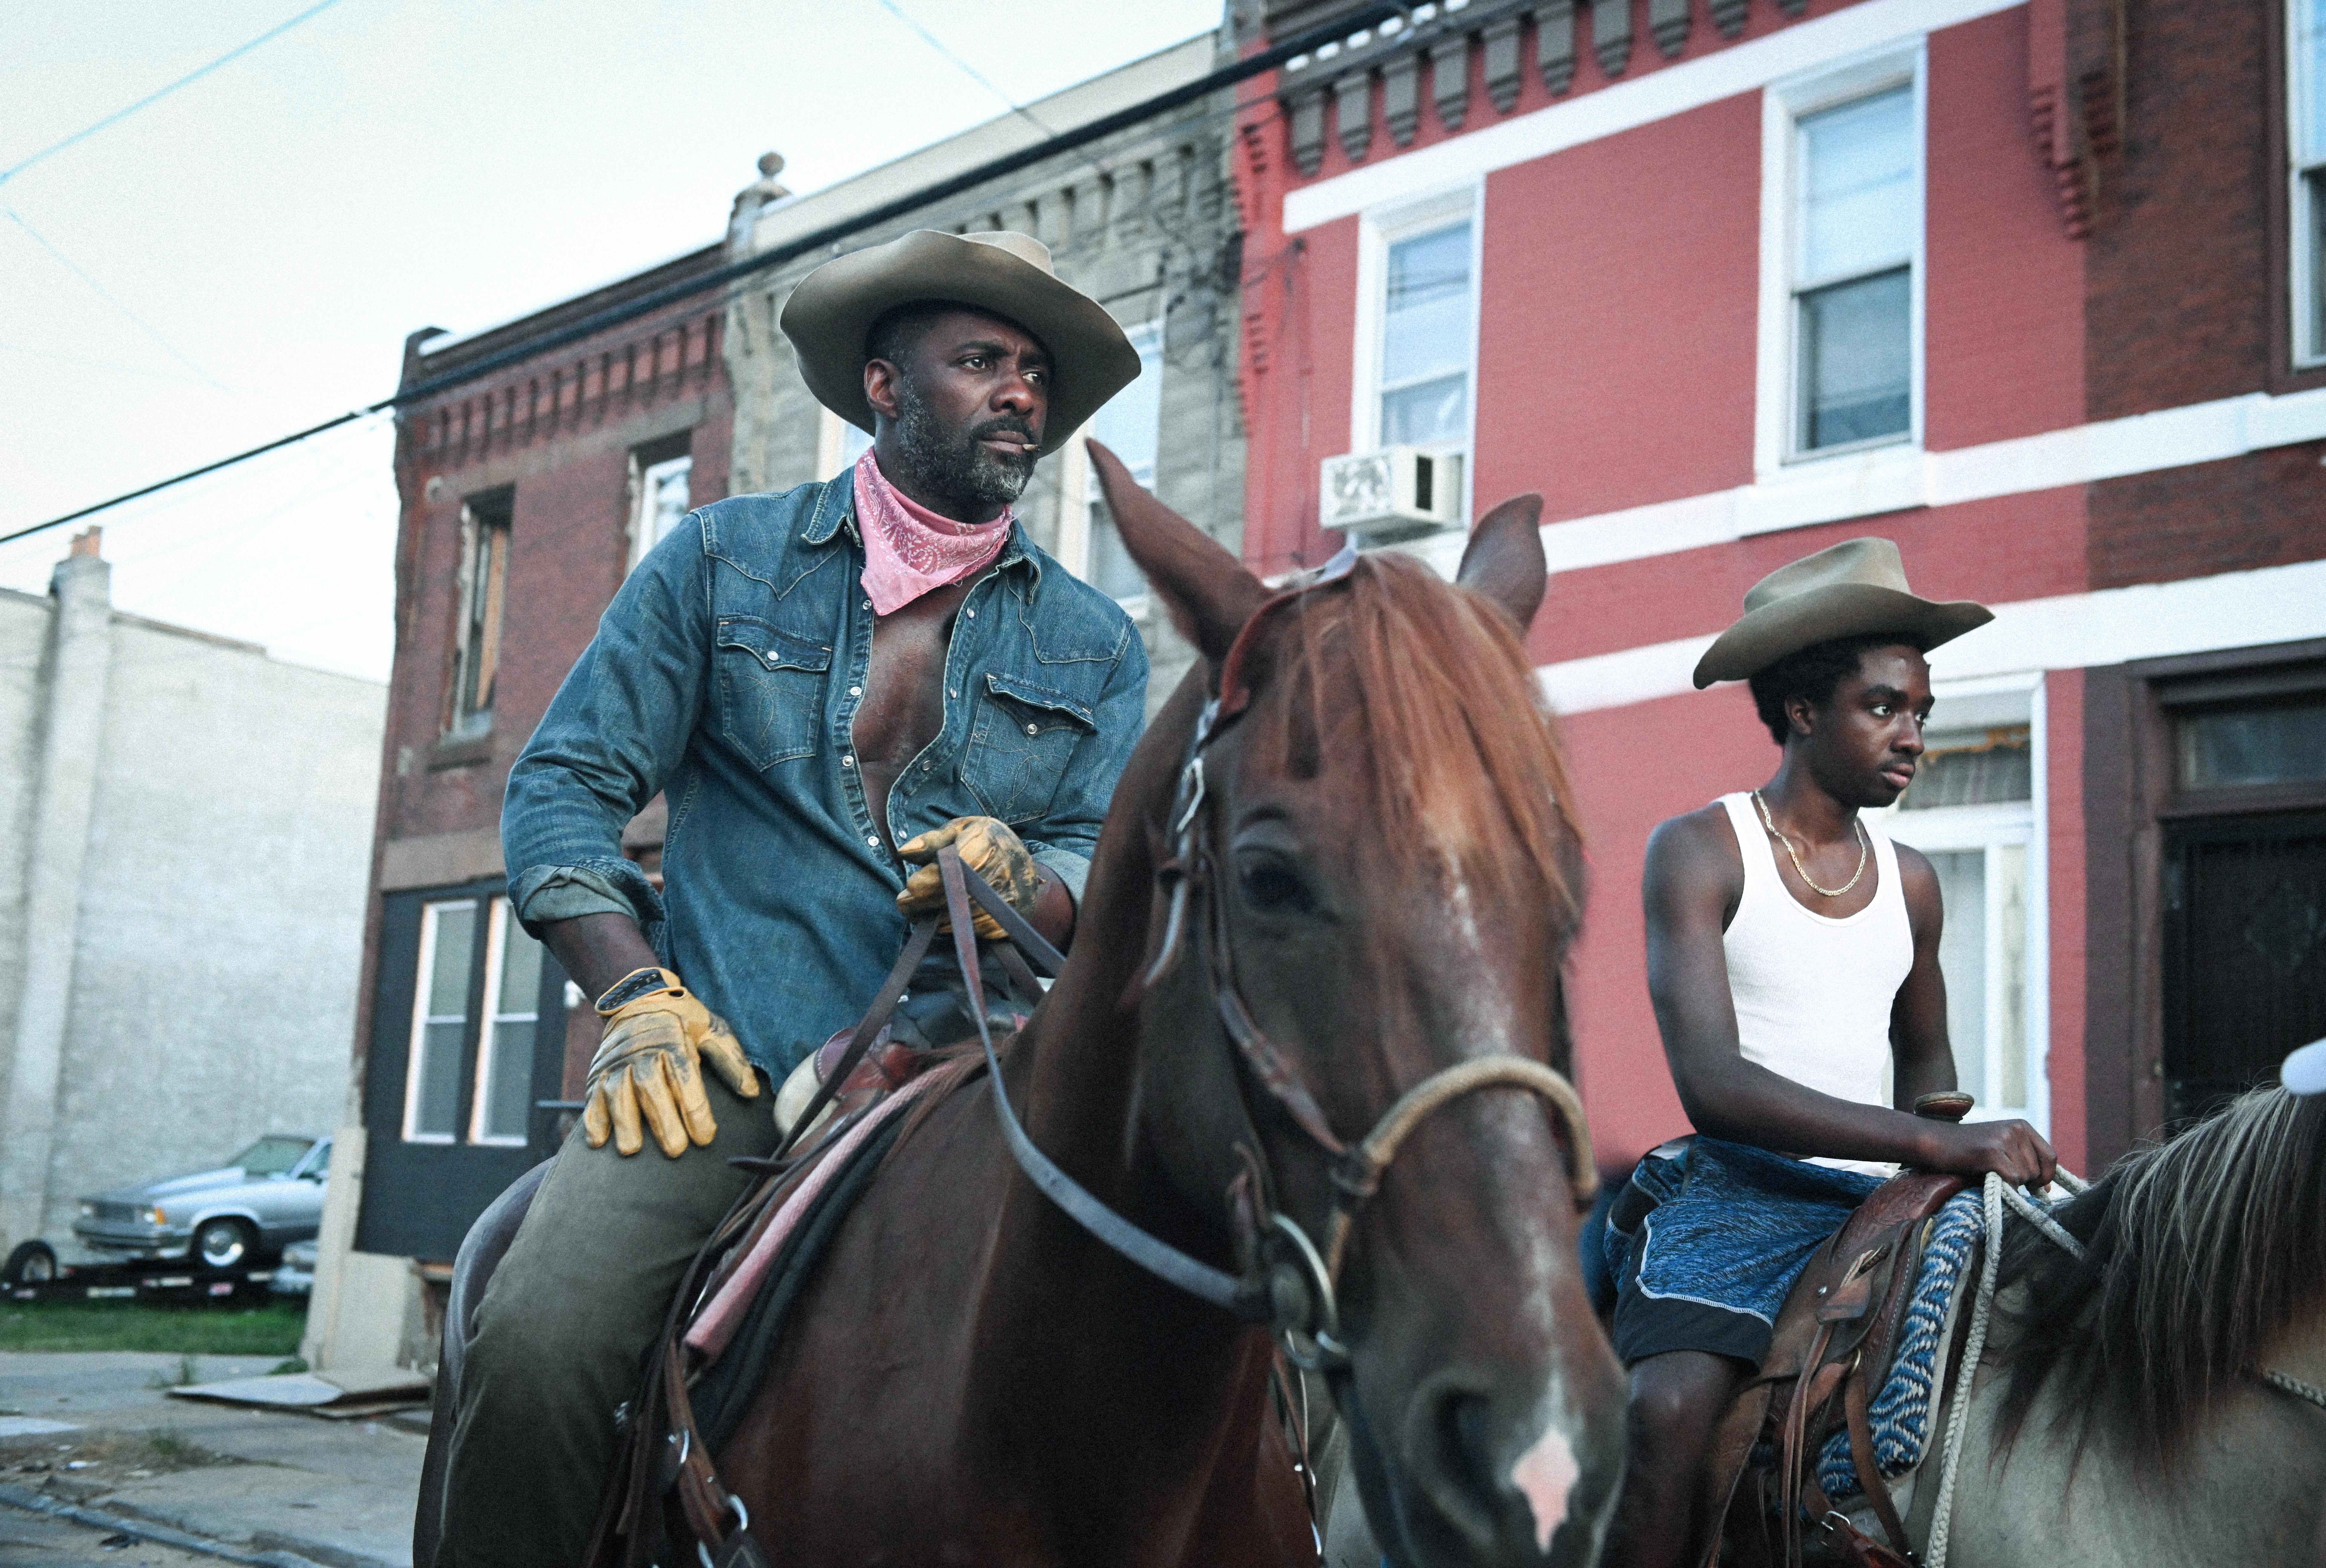 A man and a teenaged boy on horses on a Philadelphia street.